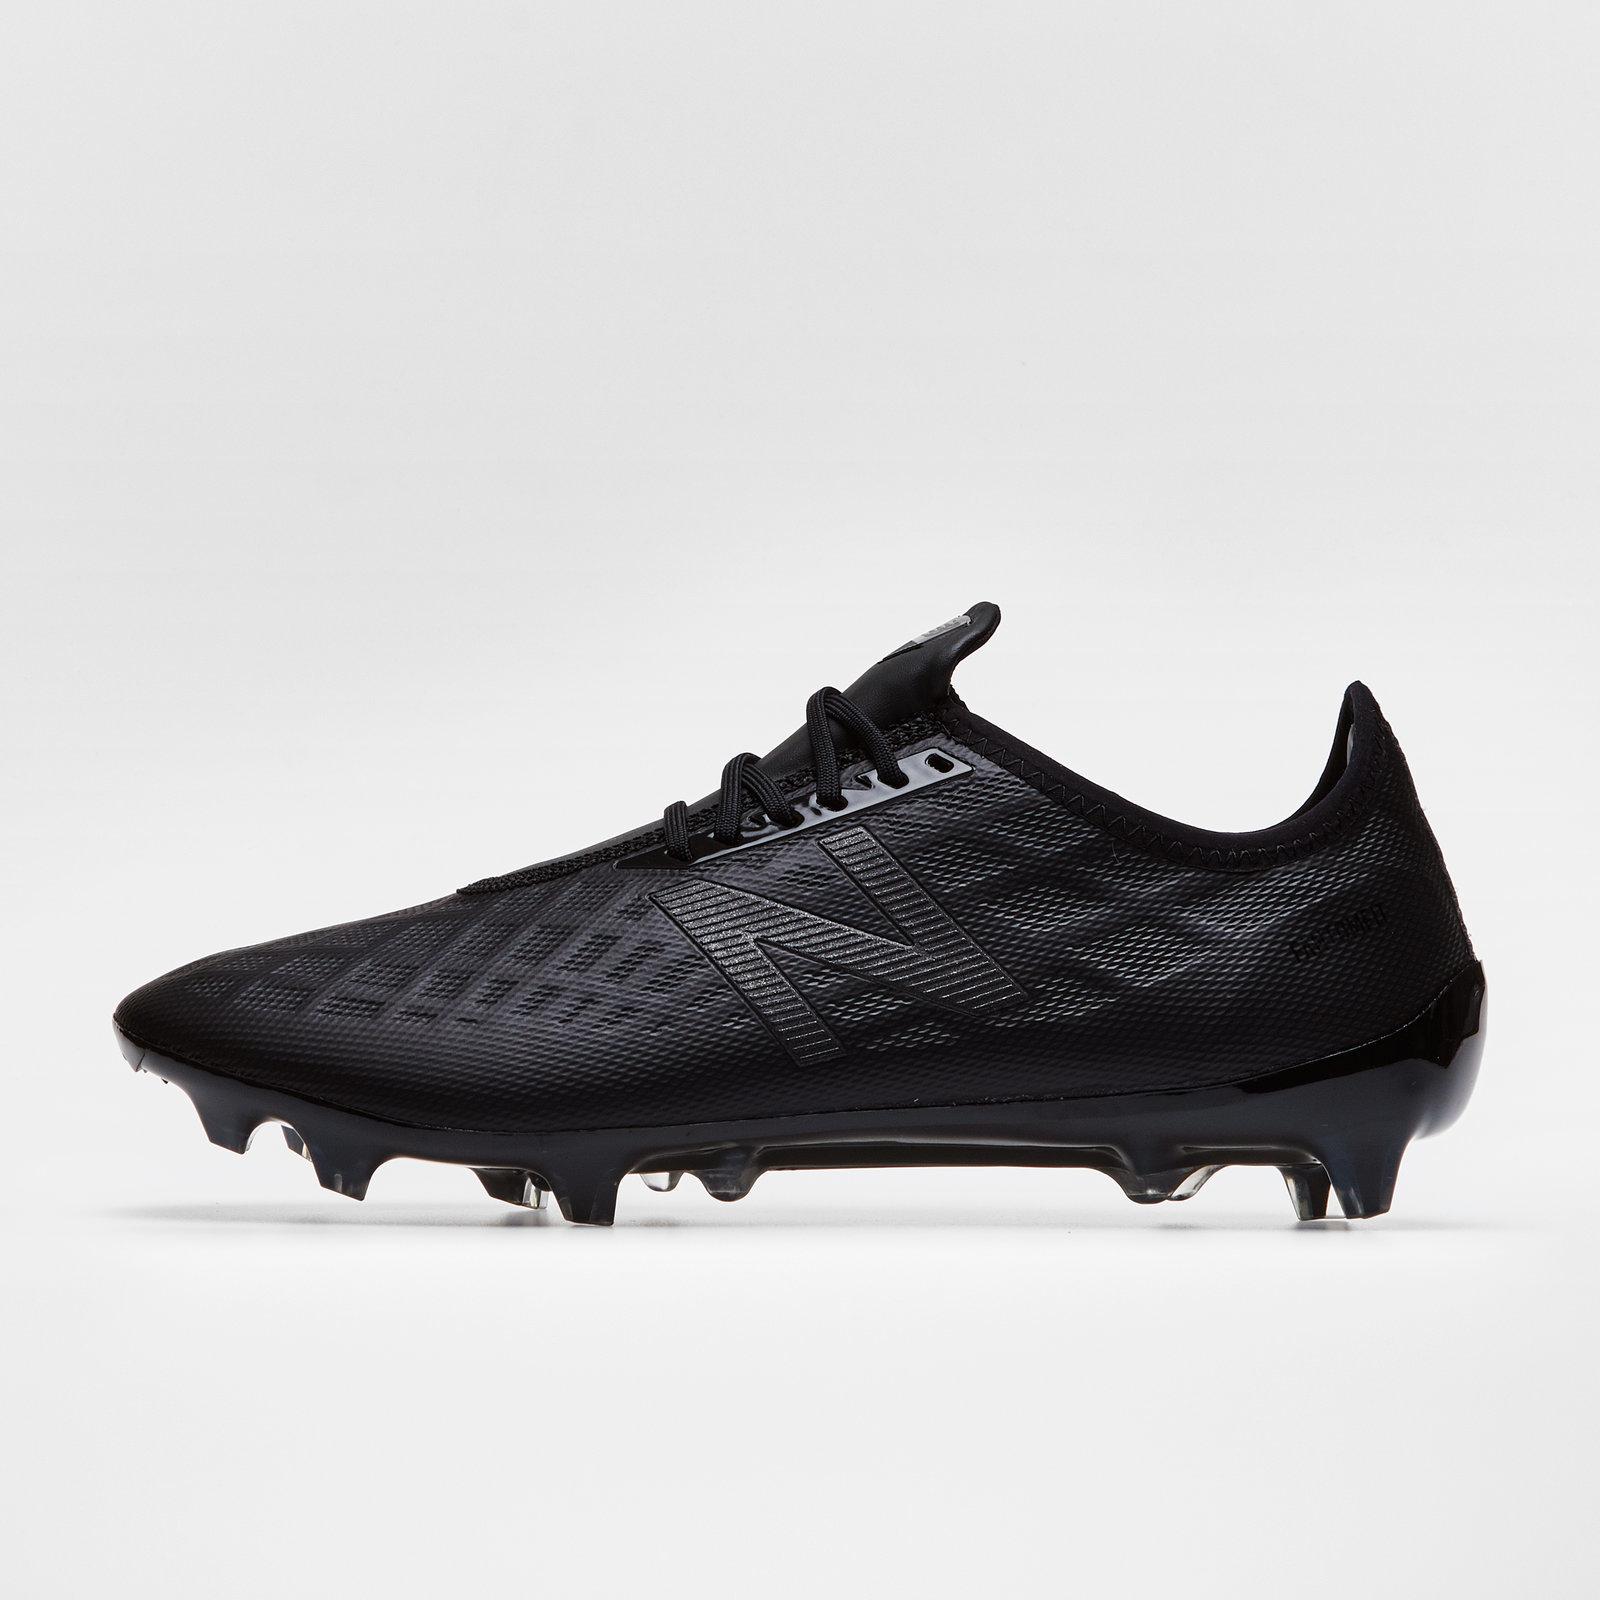 52fcee847 New balance Furon Football Boots